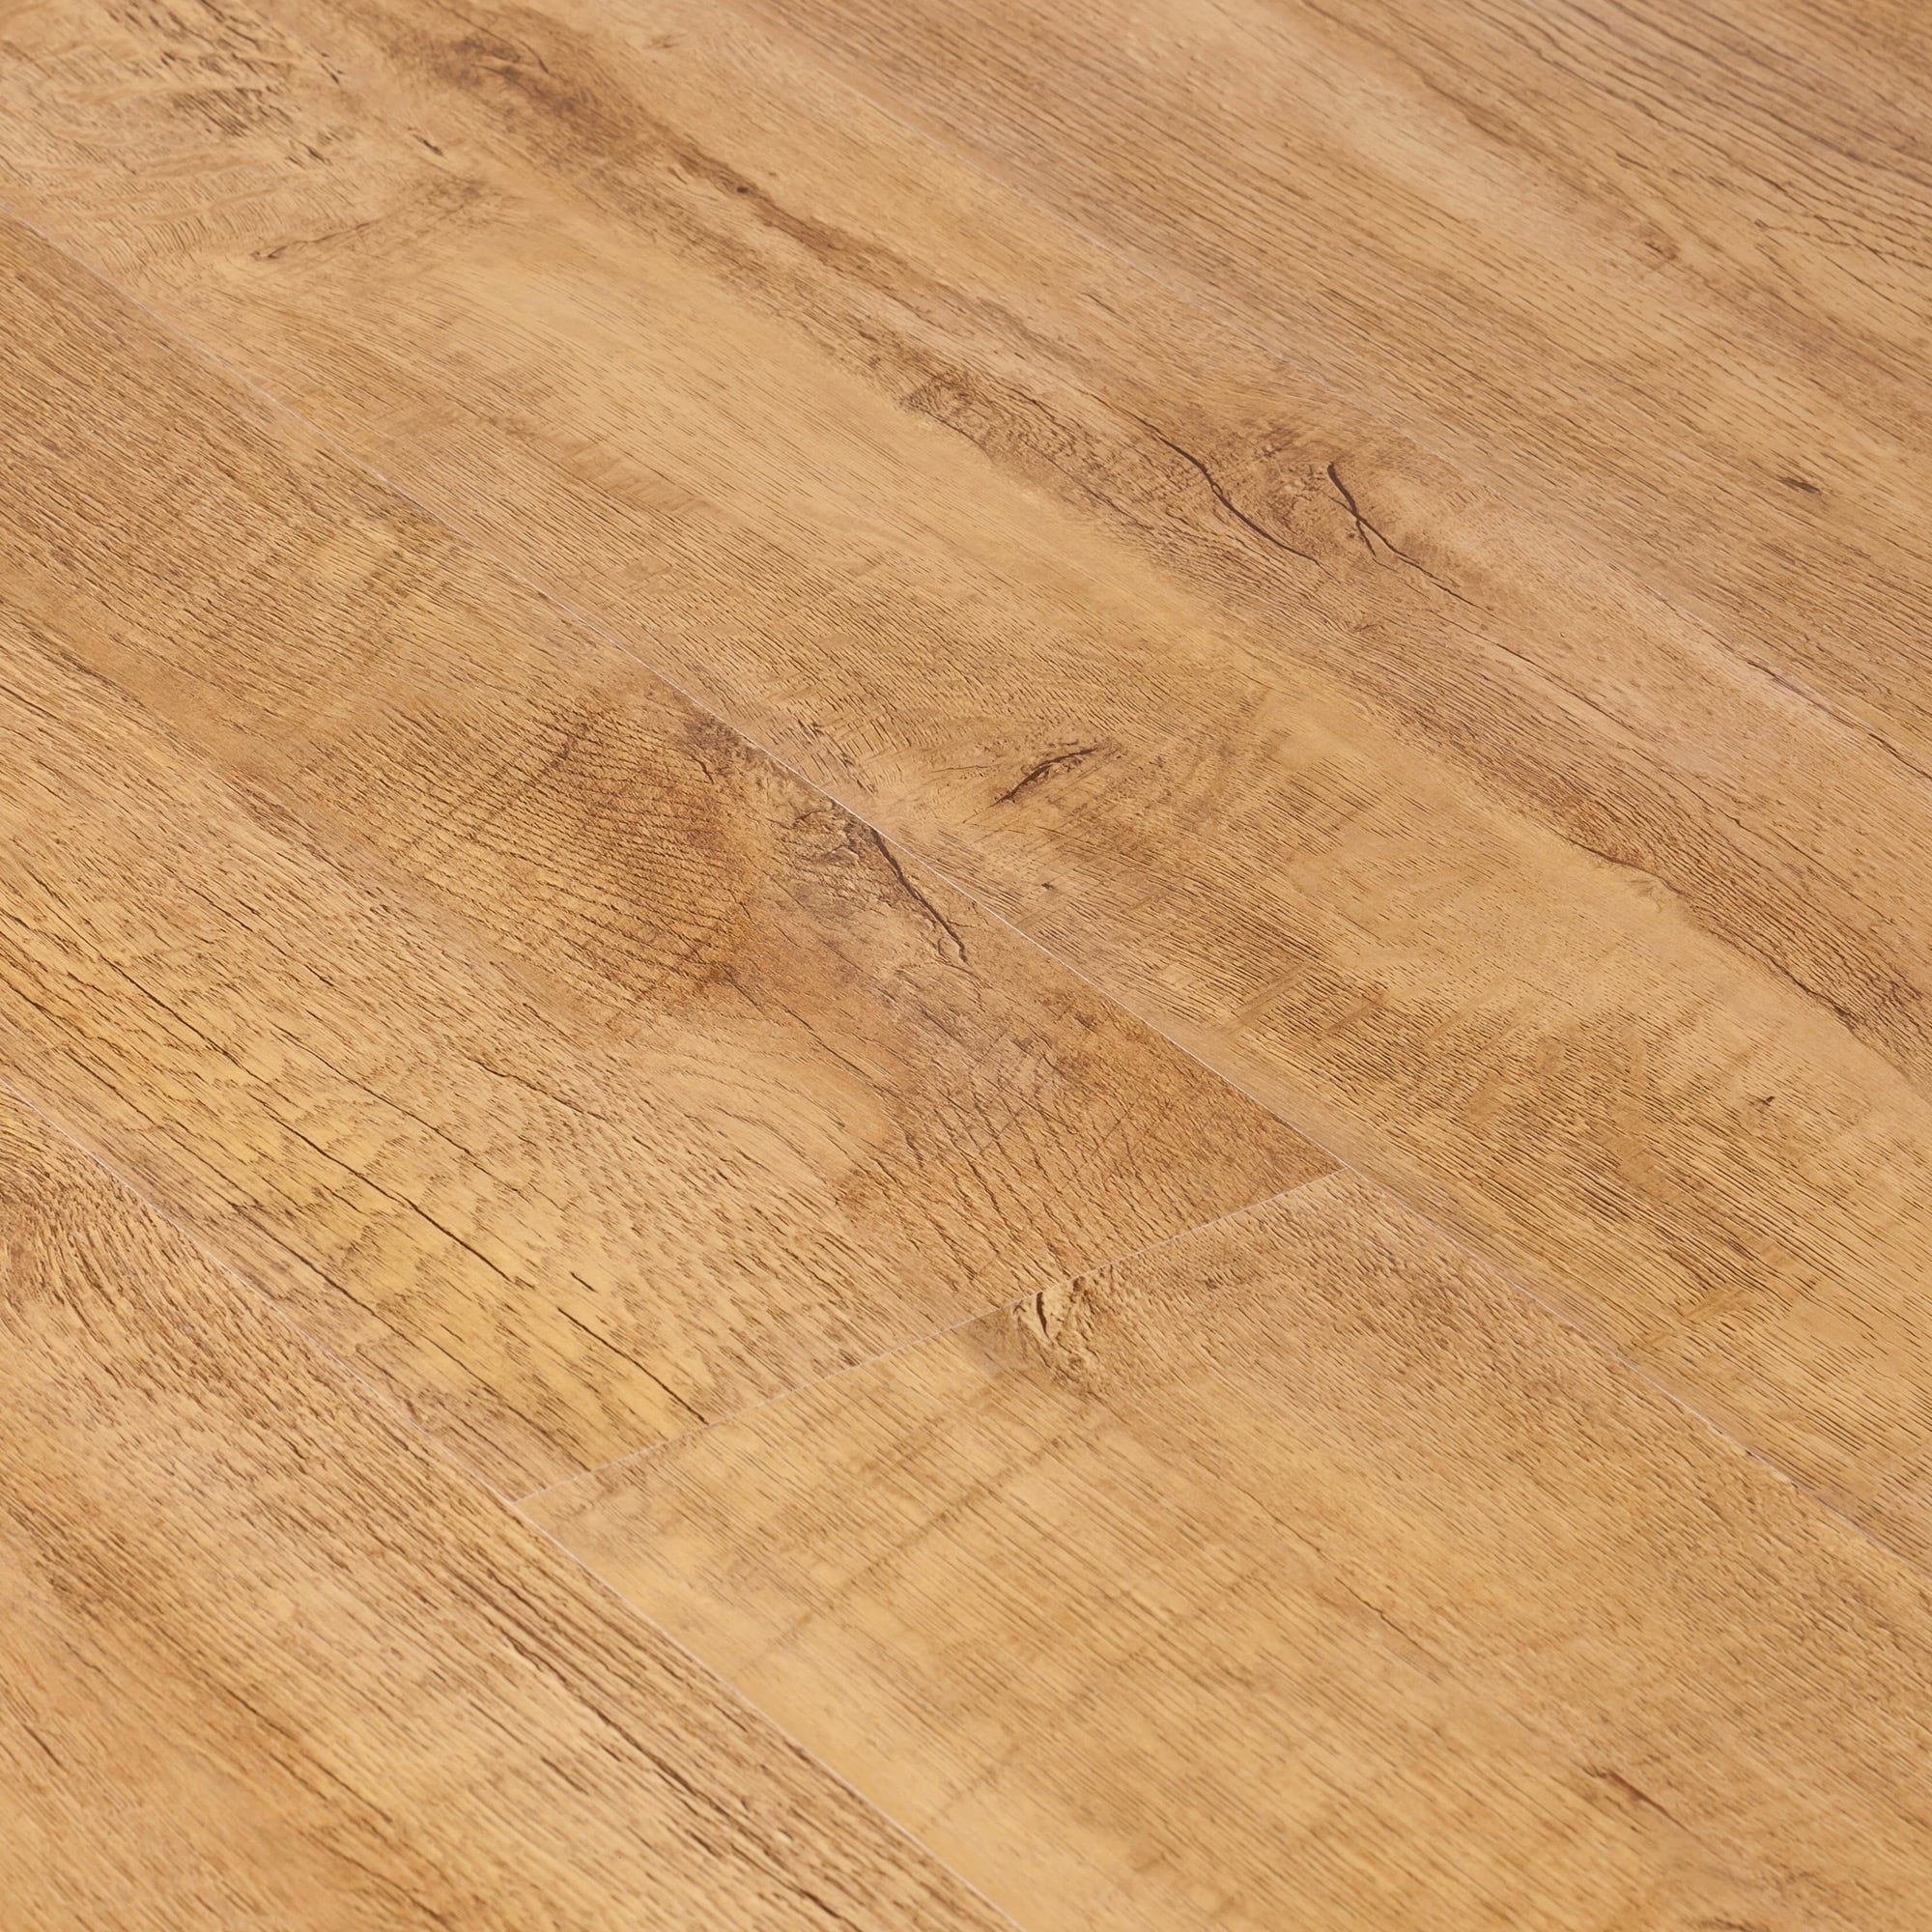 Uk Flooring Direct Harvest Oak Laminate: Krono Original Kronofix 7mm Harvester Oak Laminate